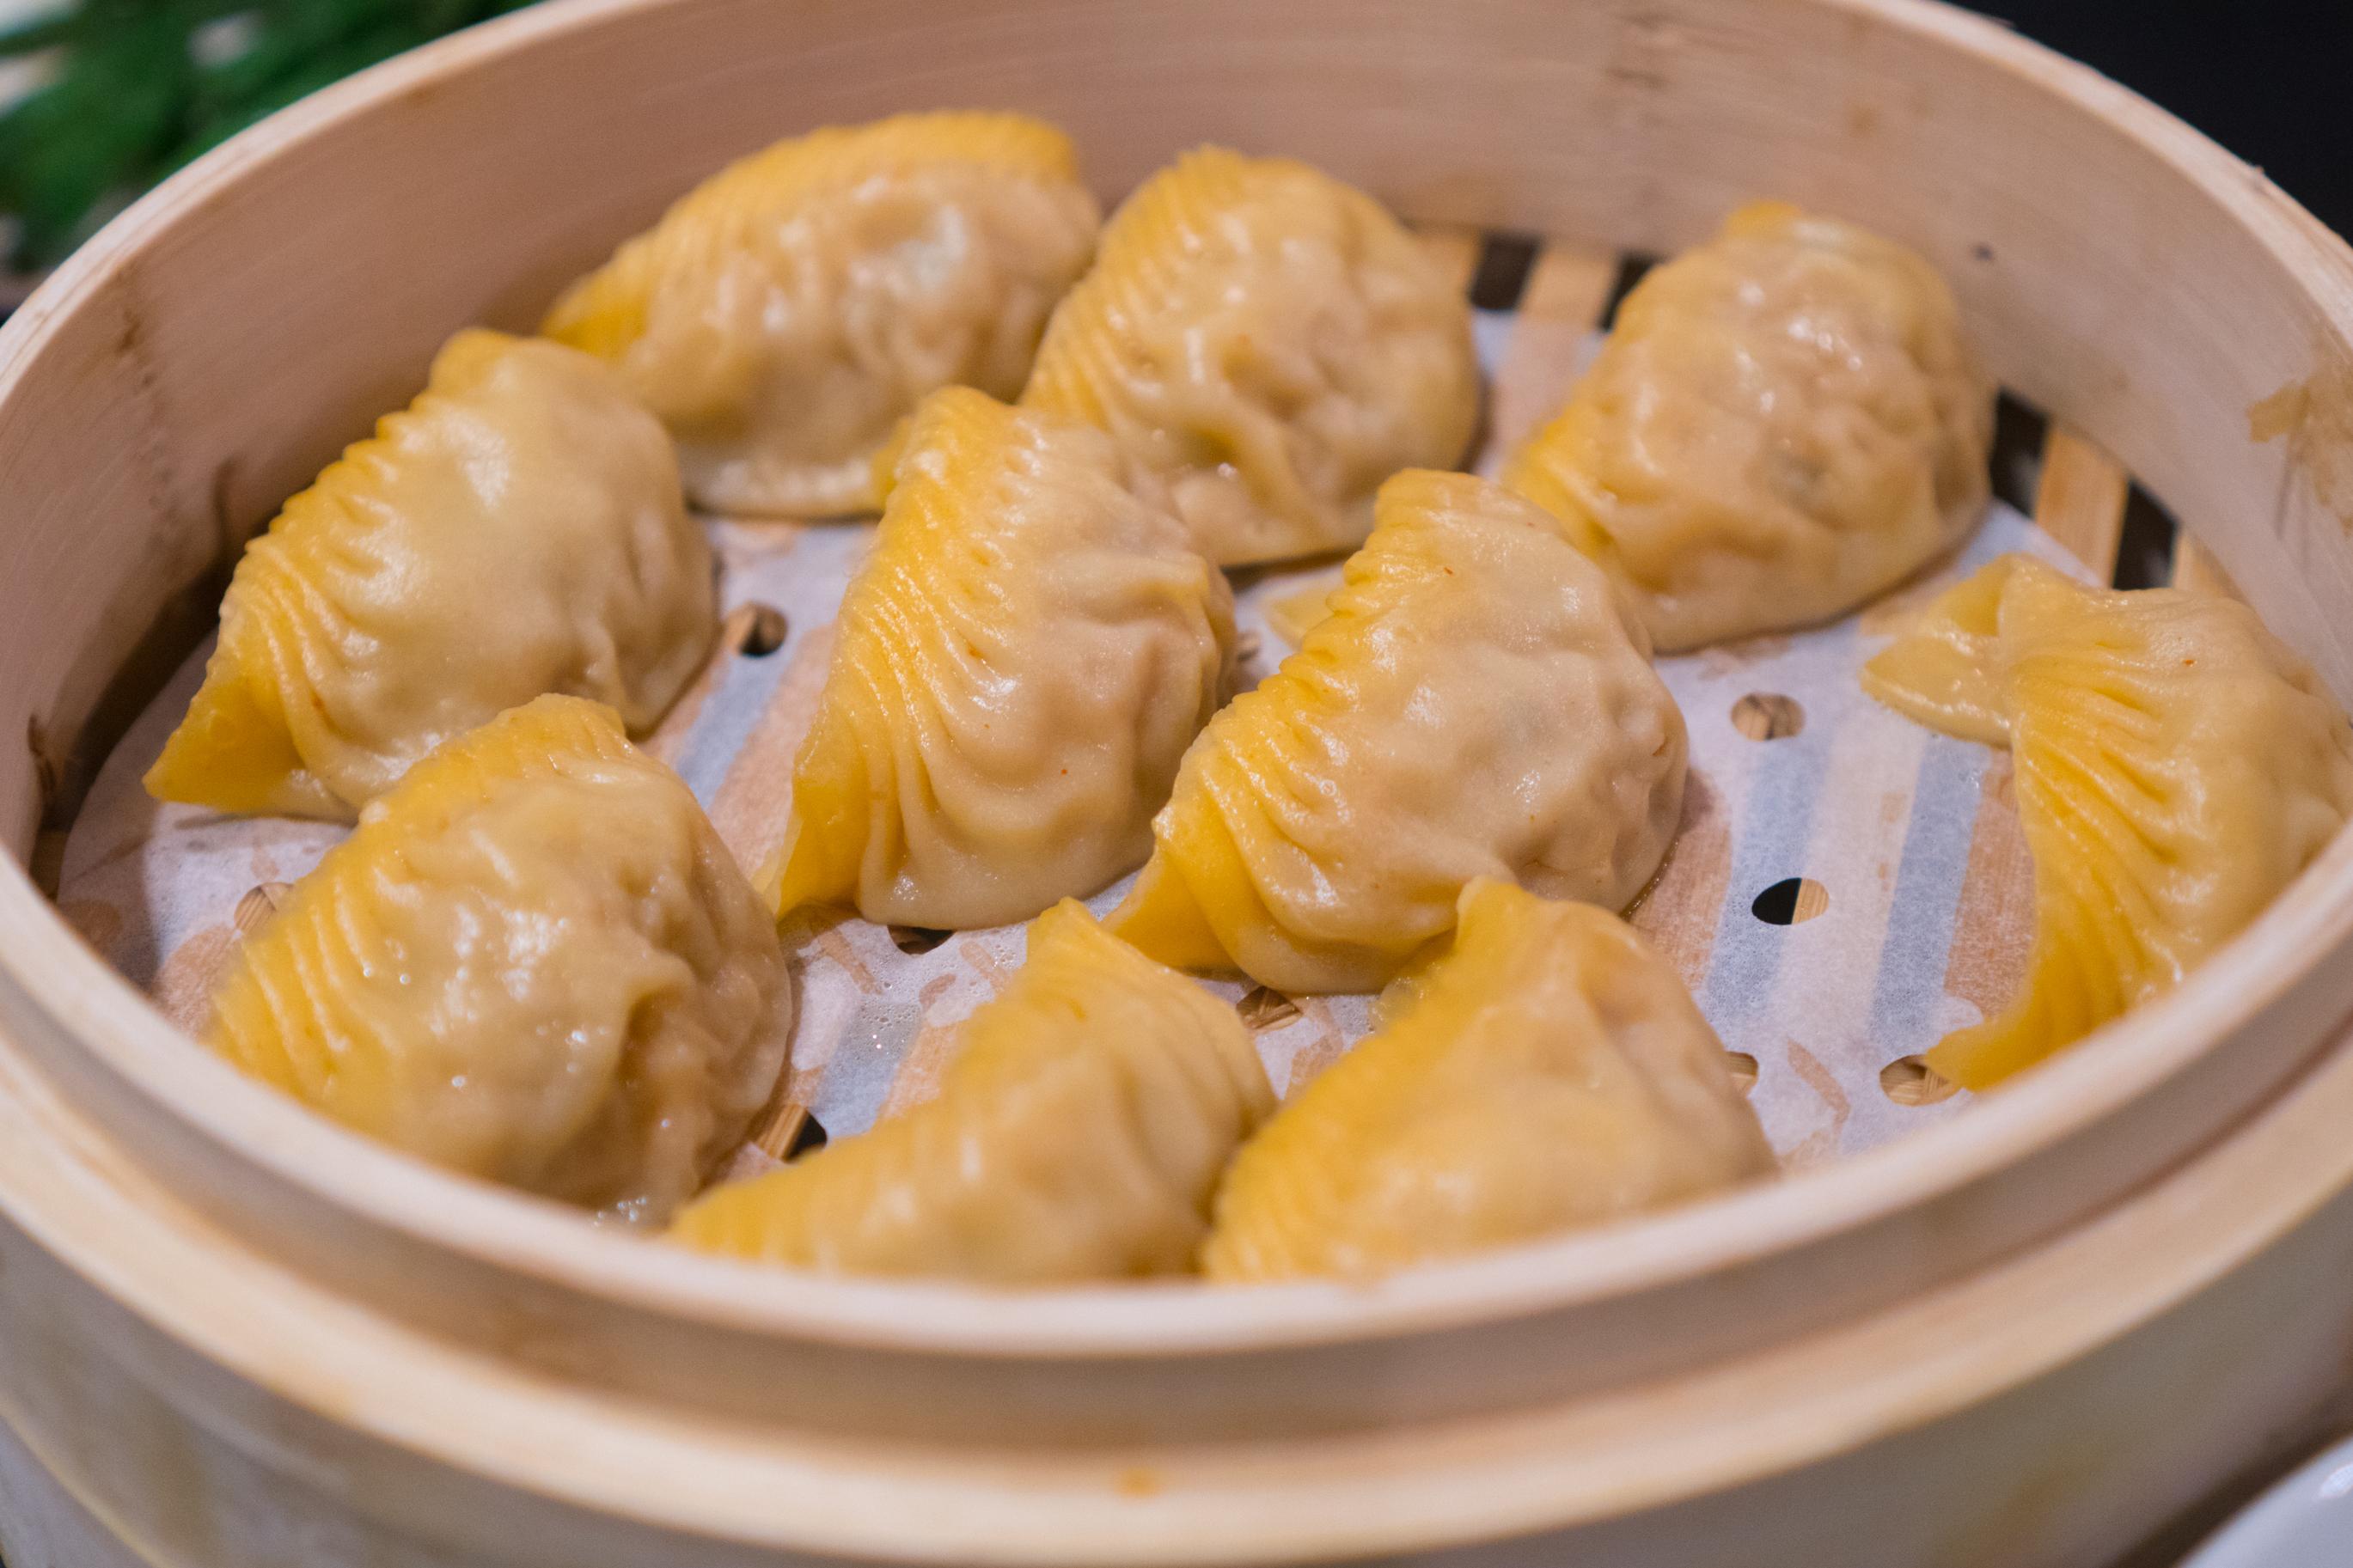 Kimchi dumplings sit in a steamer basket at Din Tai Fung